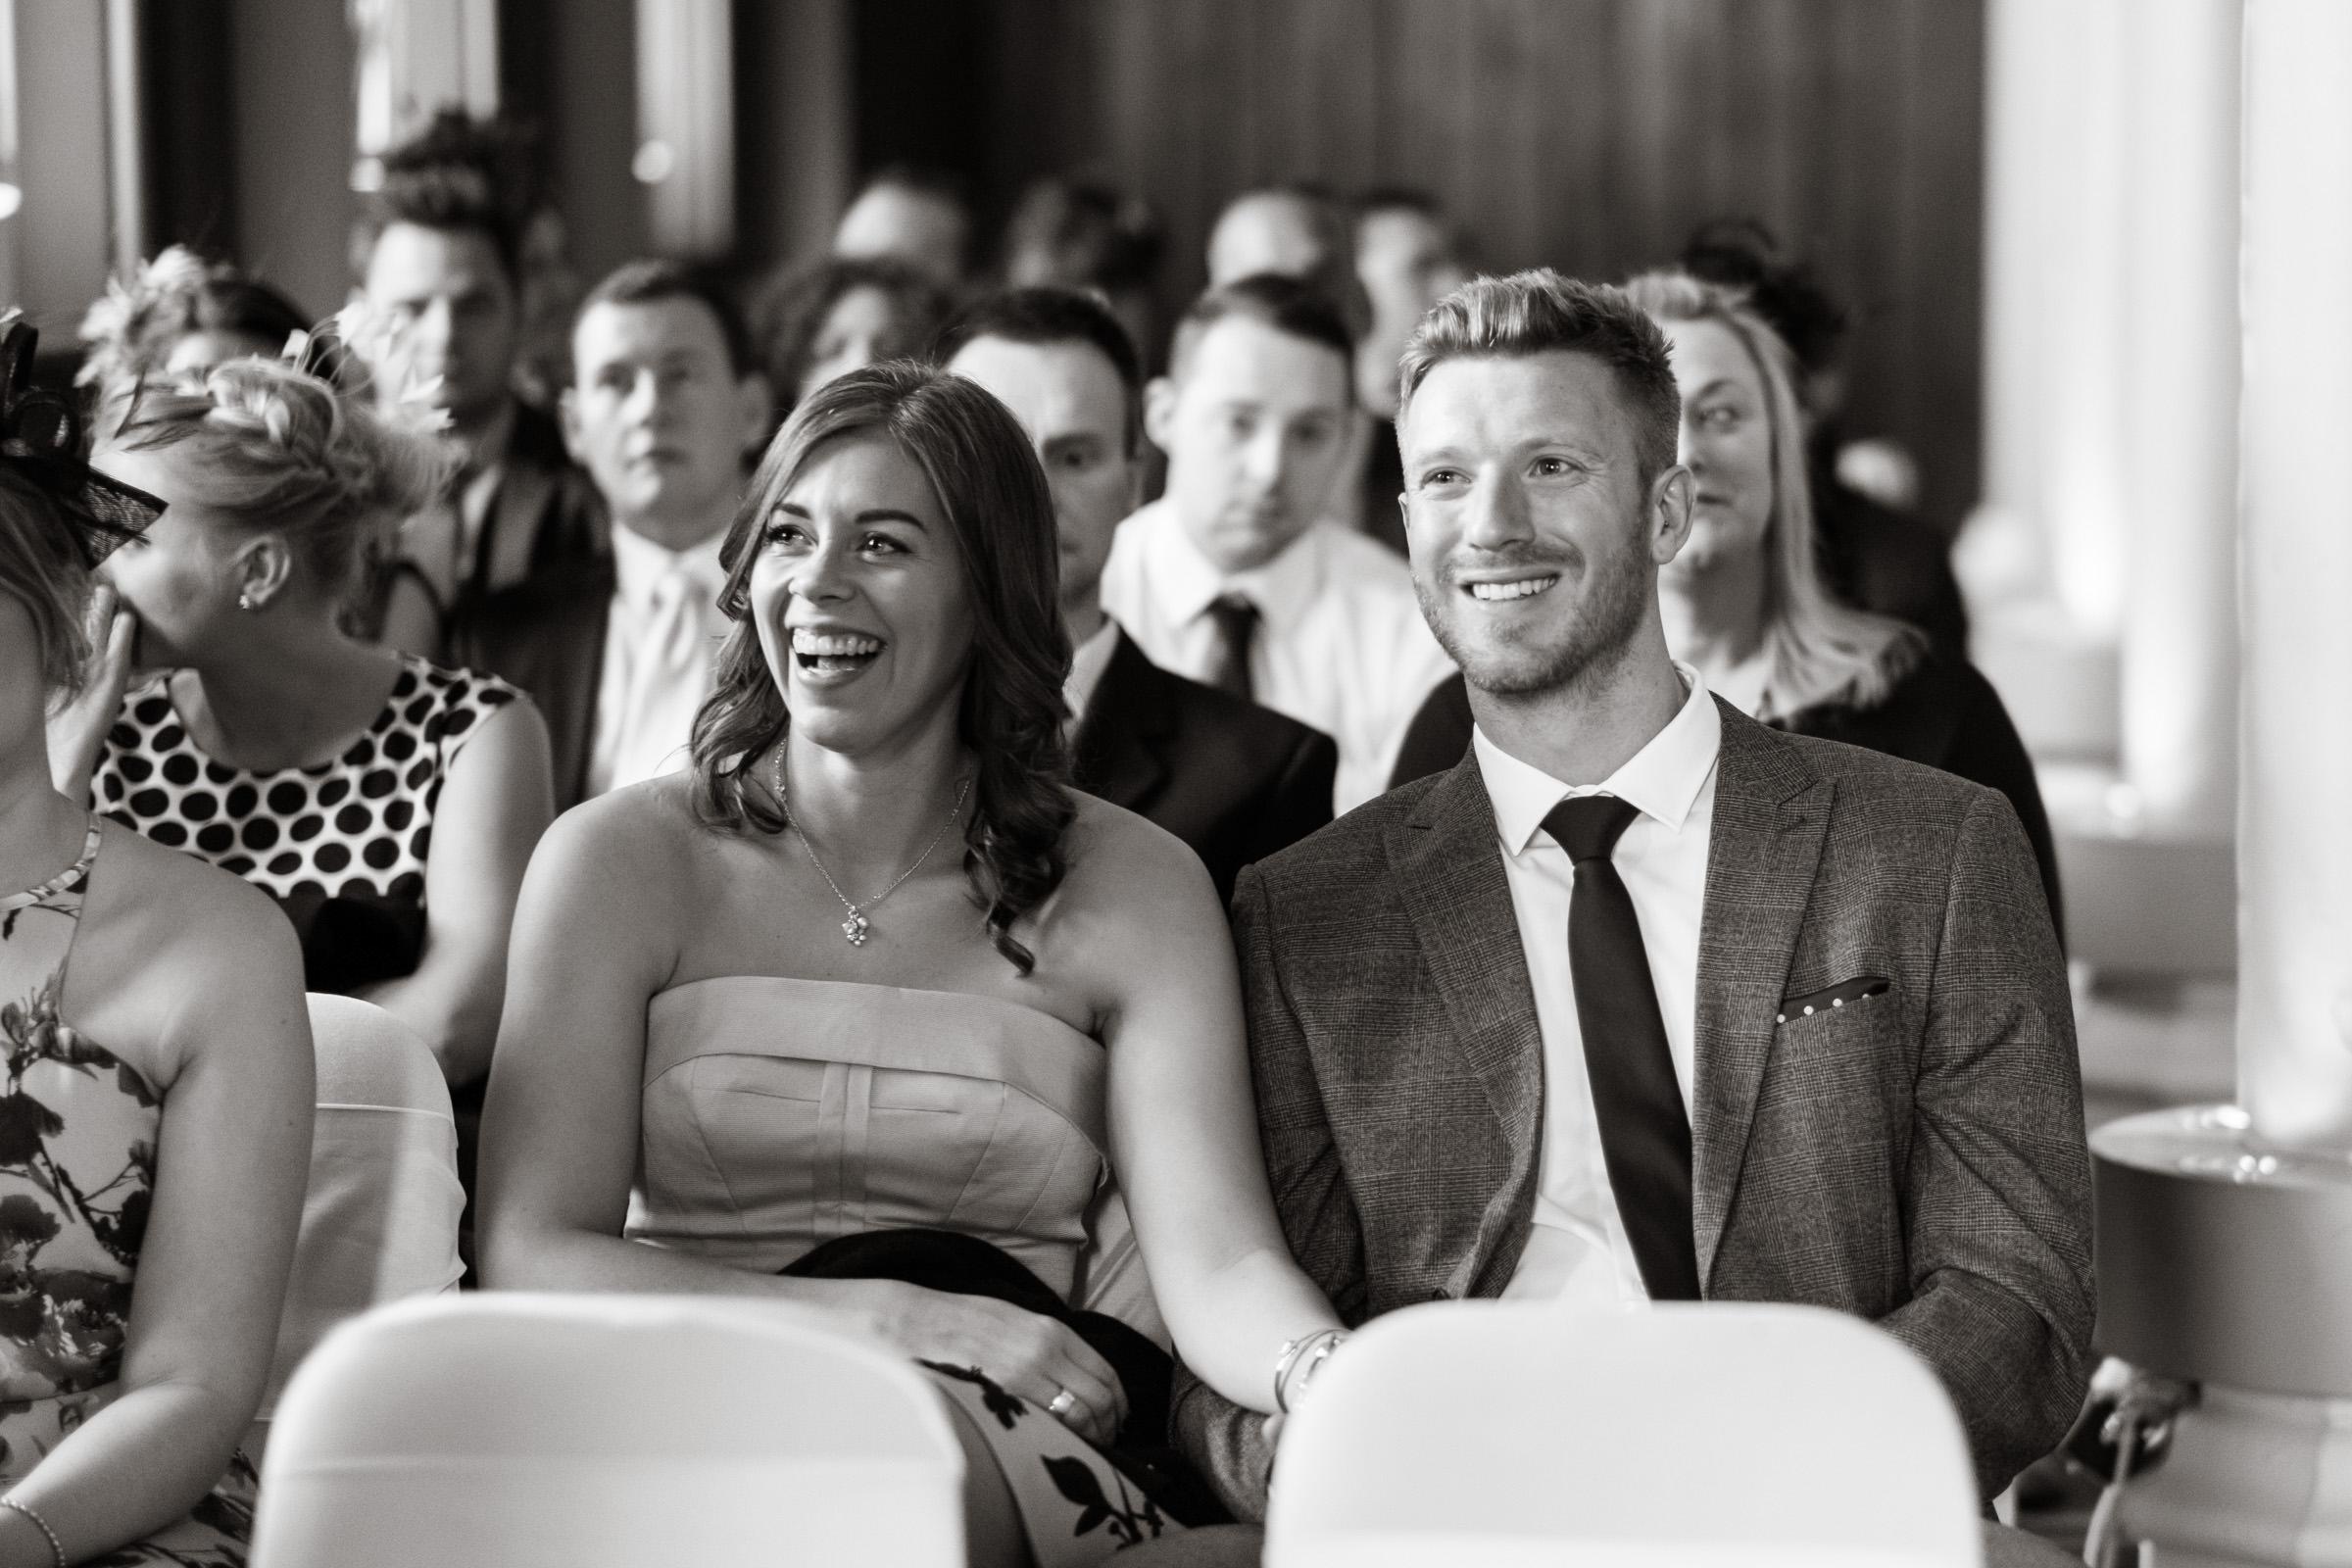 Donna & Nick's Wedding at Wotton House in Dorking 007.jpg